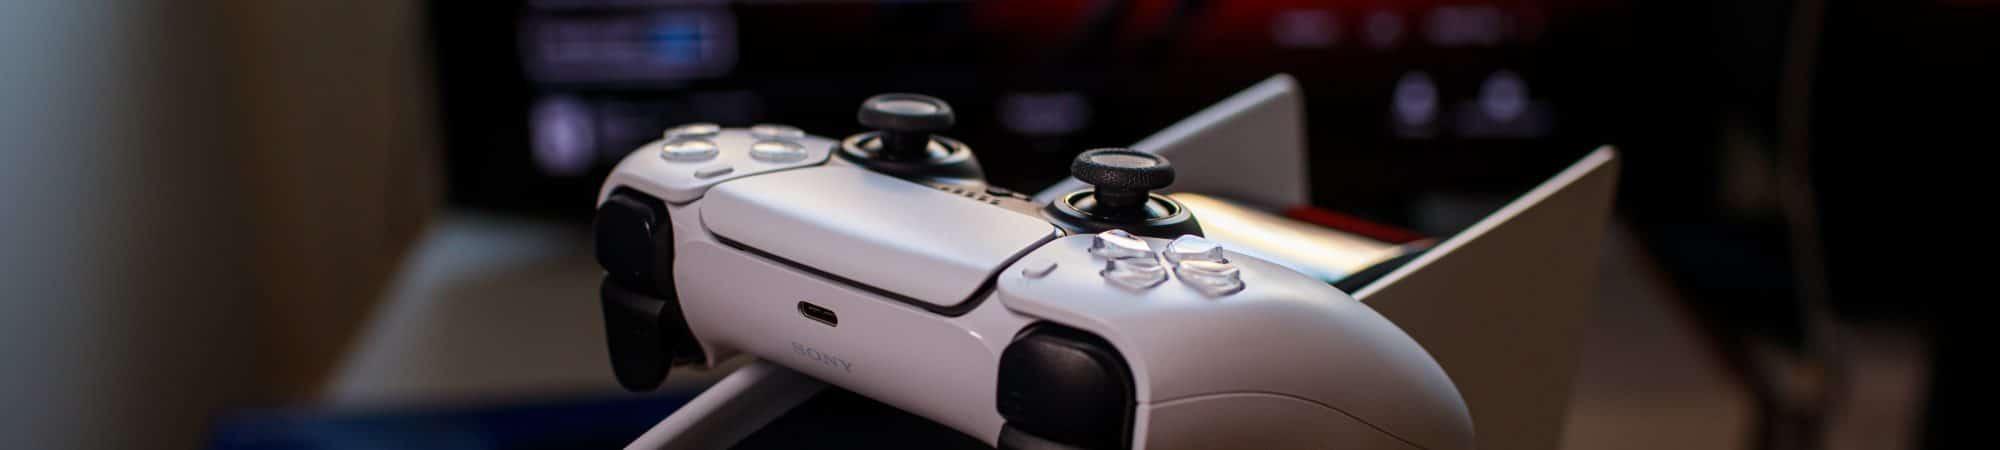 PlayStation 5 (PS5). Imagem: Girts Ragelis / Shutterstock.com